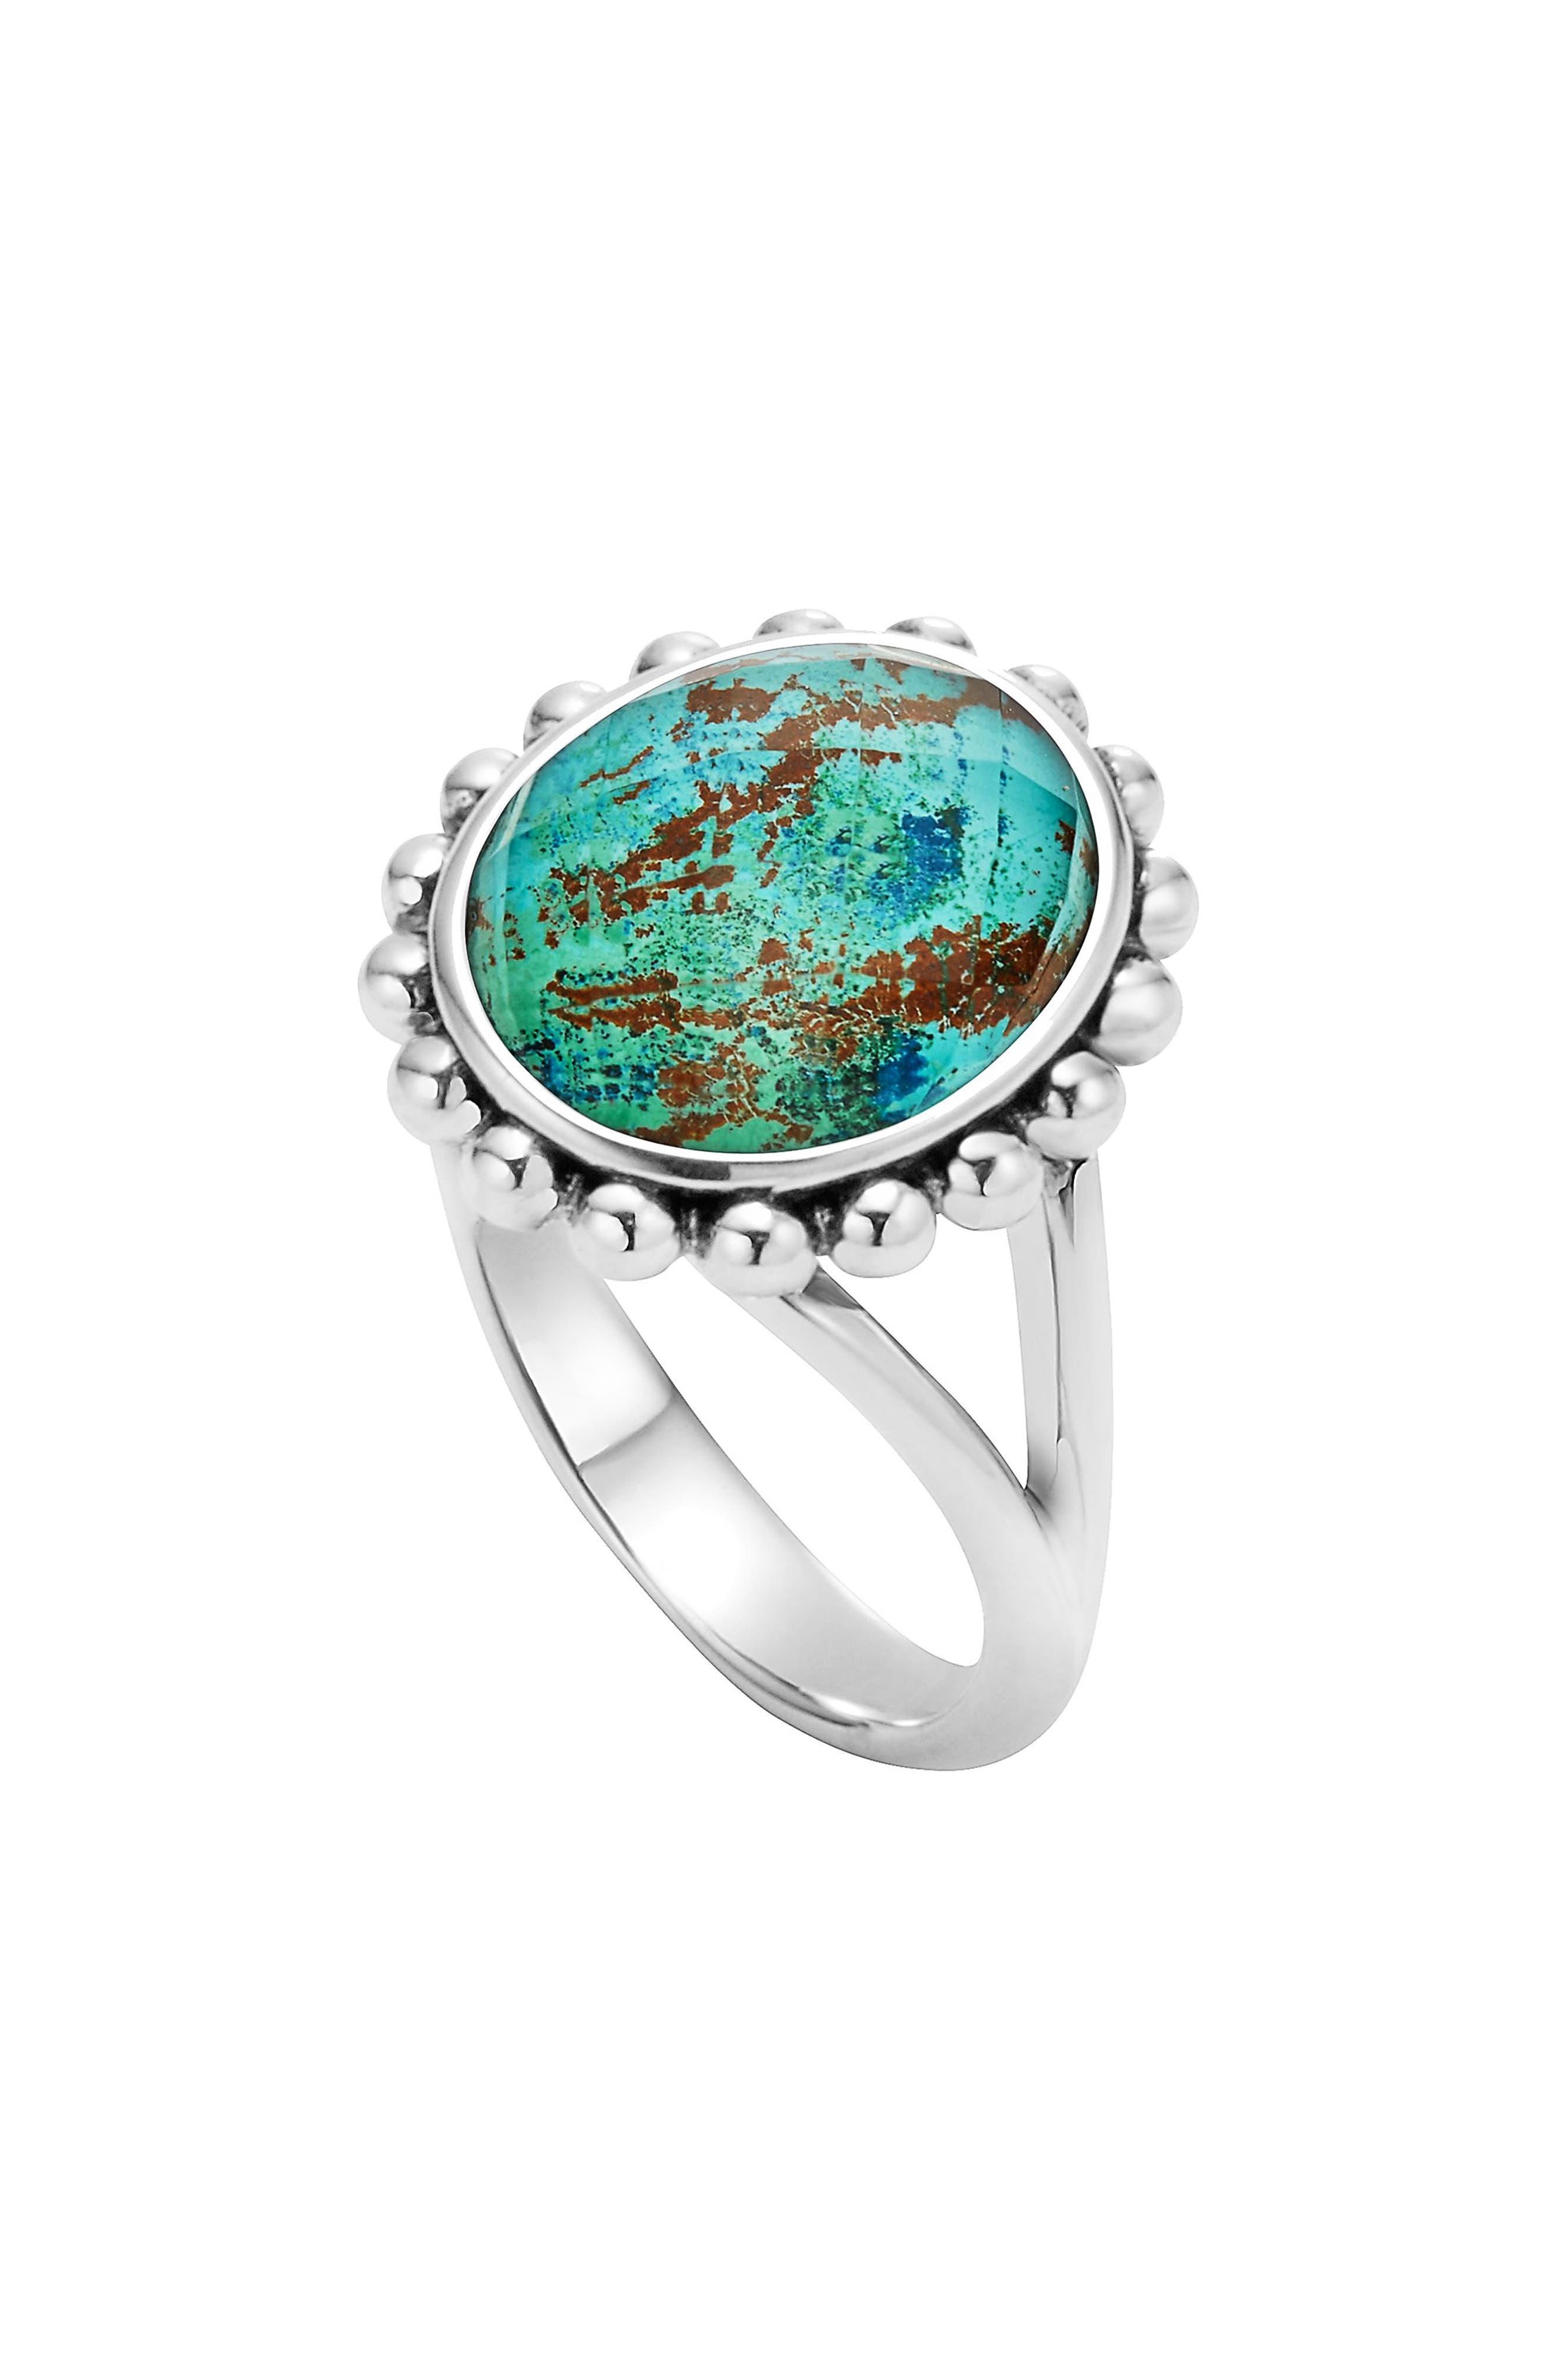 Alternate Image 1 Selected - LAGOS 'Maya' Small Doublet Ring